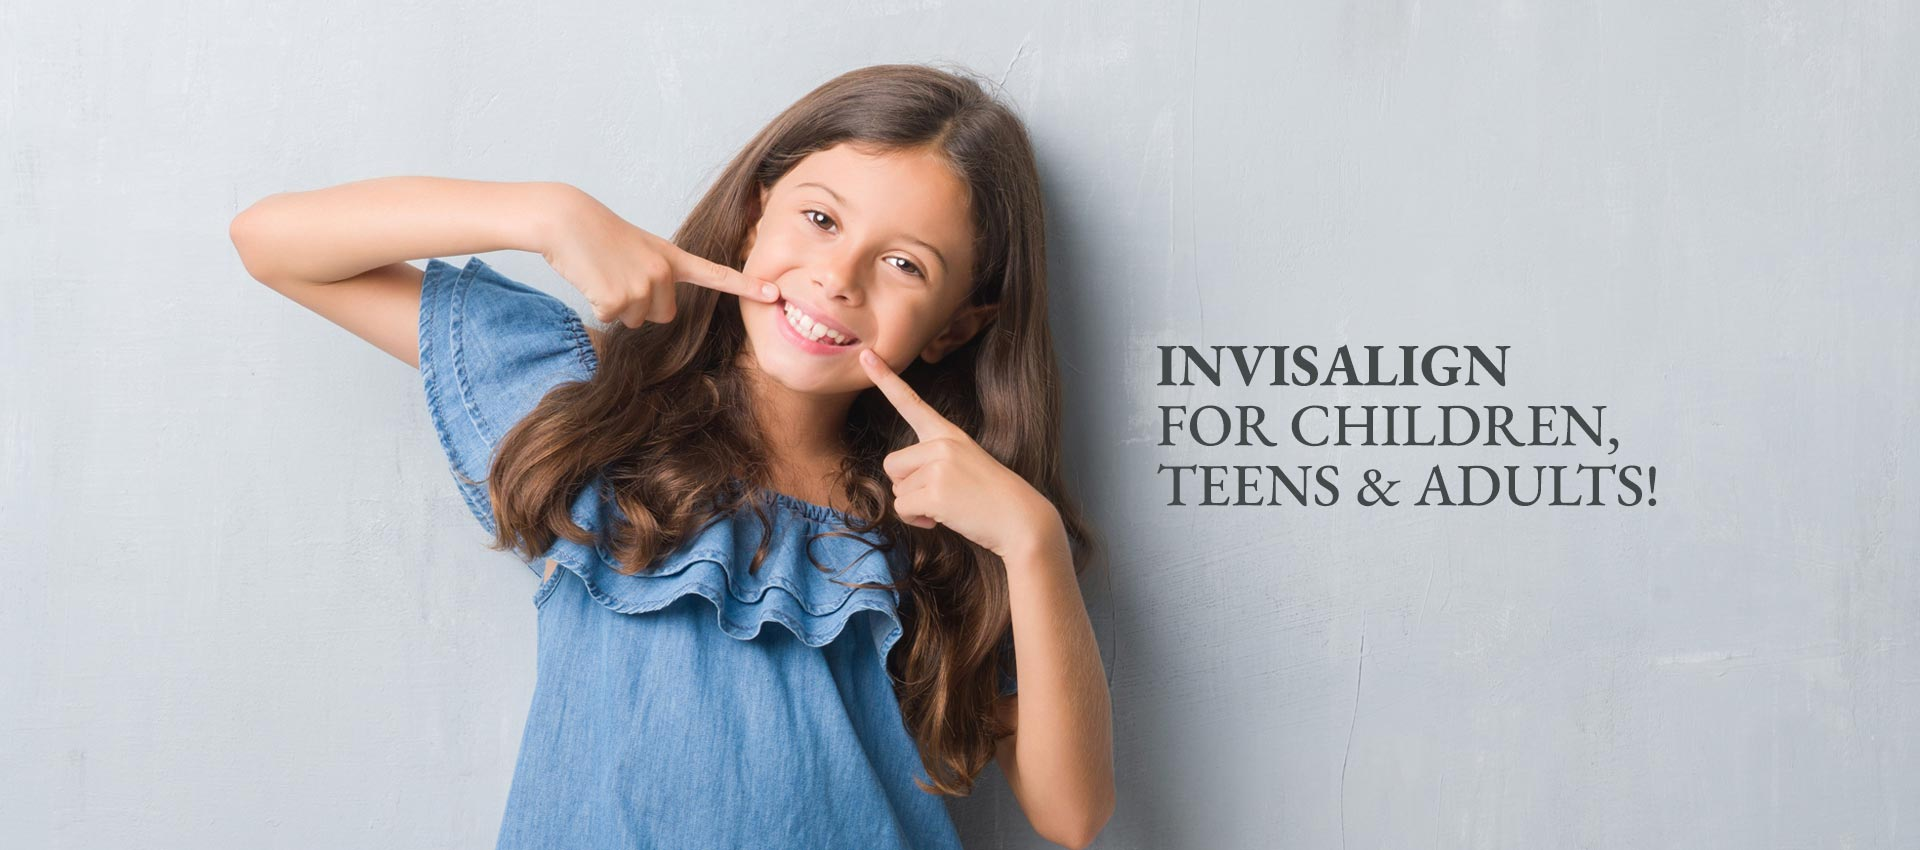 Invisalign for children Talbot Orthodontics in Citrus Heights and Roseville, CA